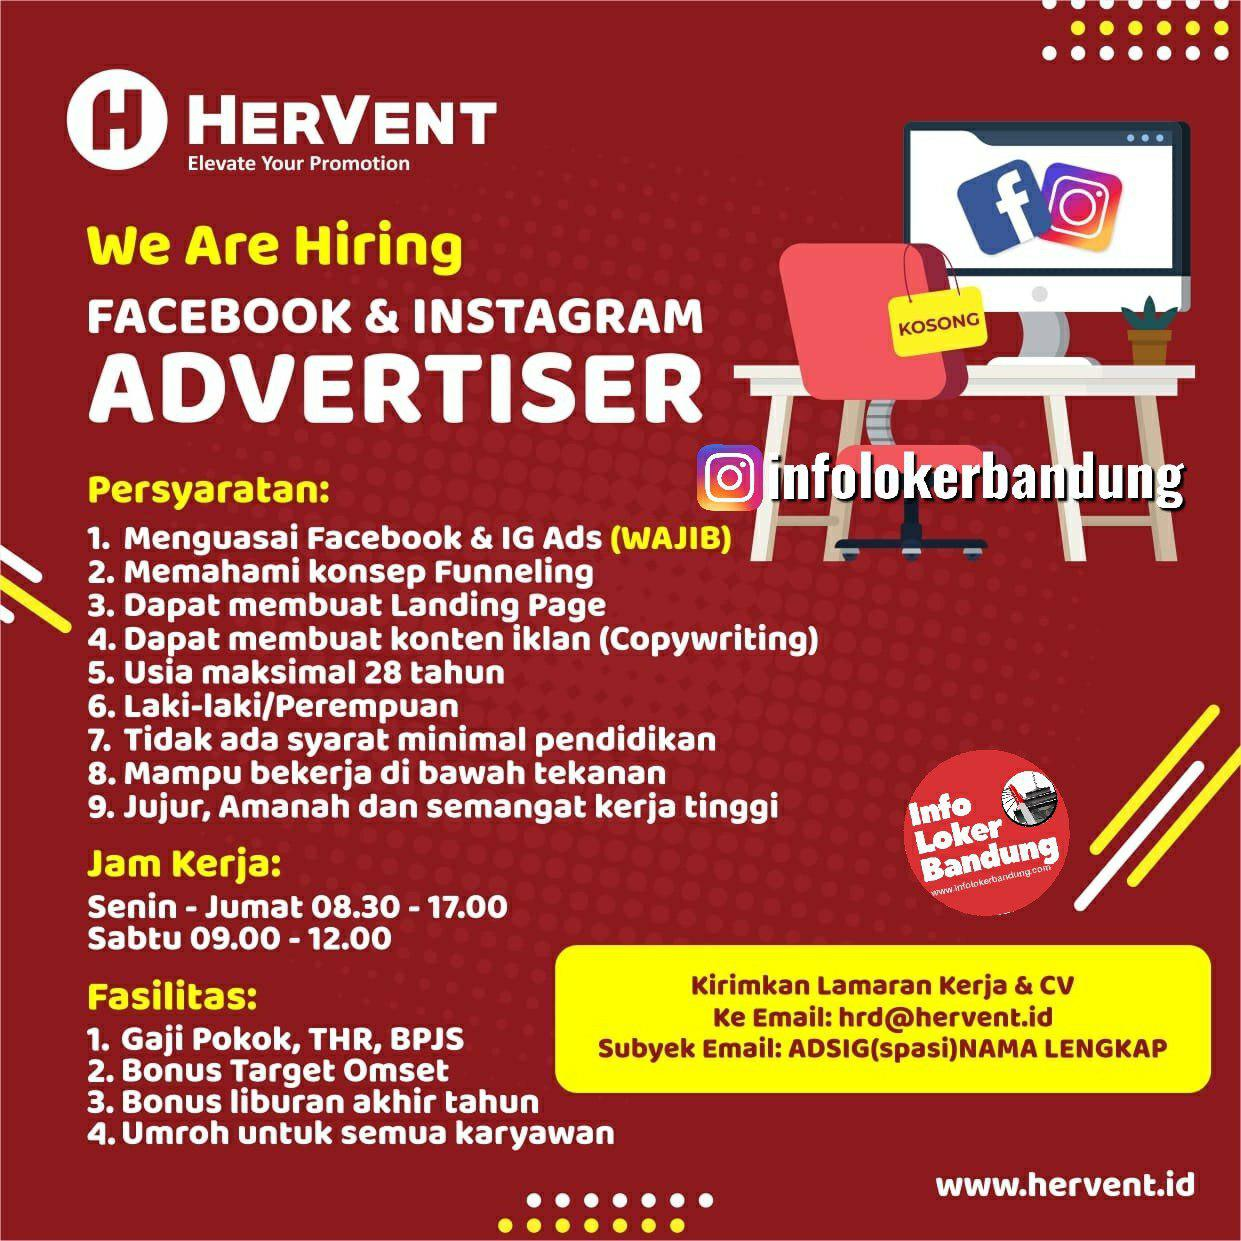 Lowongan Kerja HerVent Bandung Desember 2019